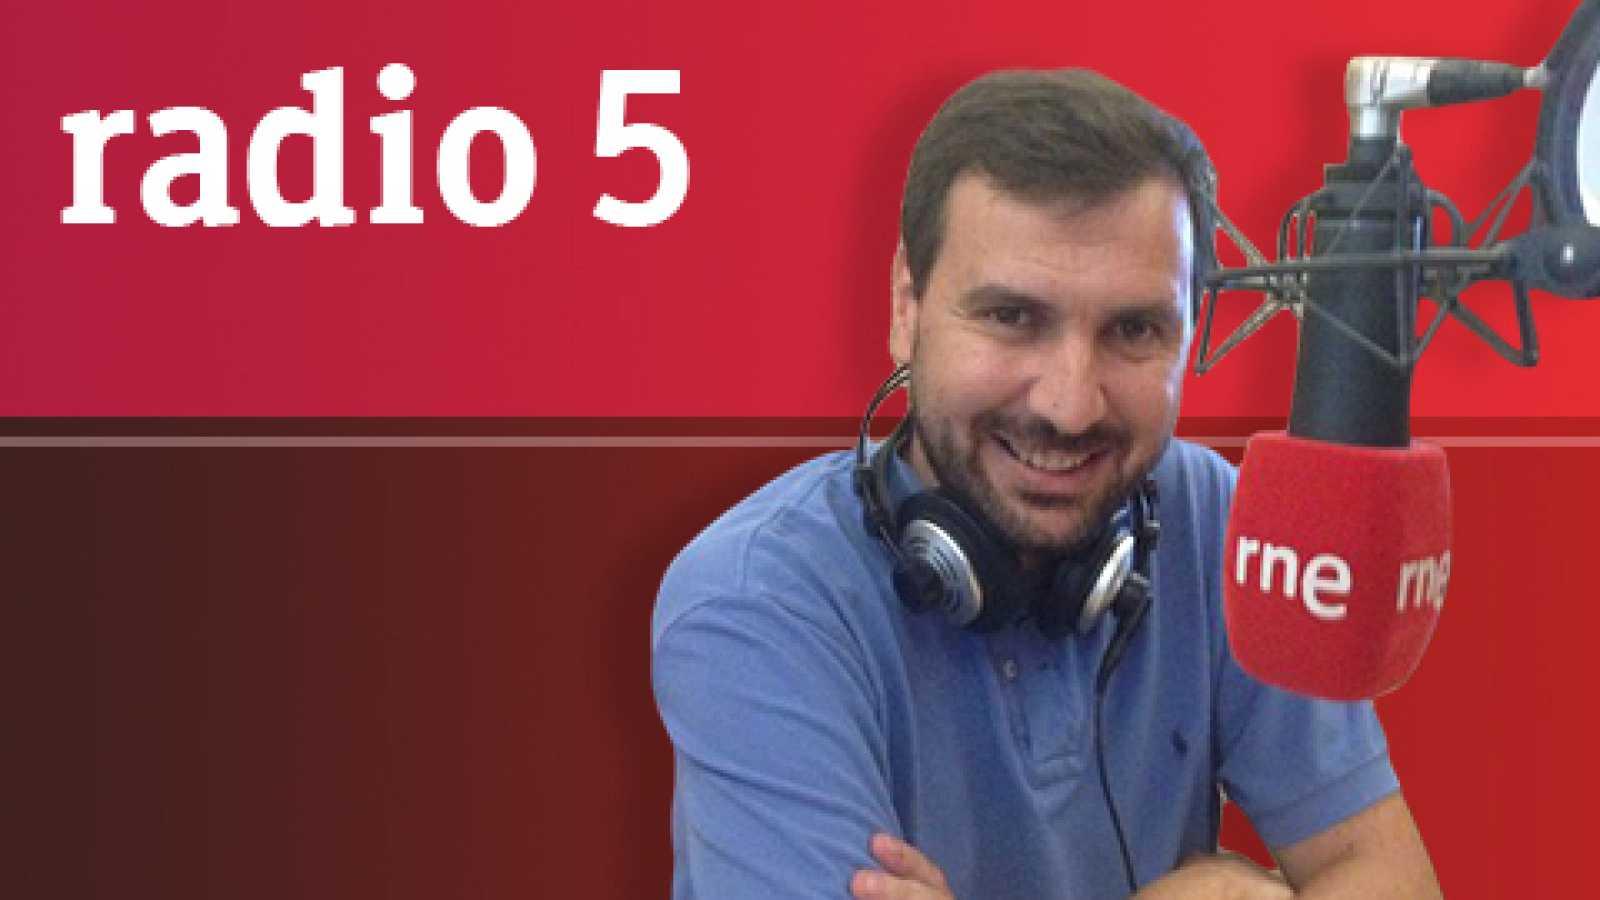 Kilómetros de radio - Quinta hora - Adiós - 30/9/18 - Escuchar ahora